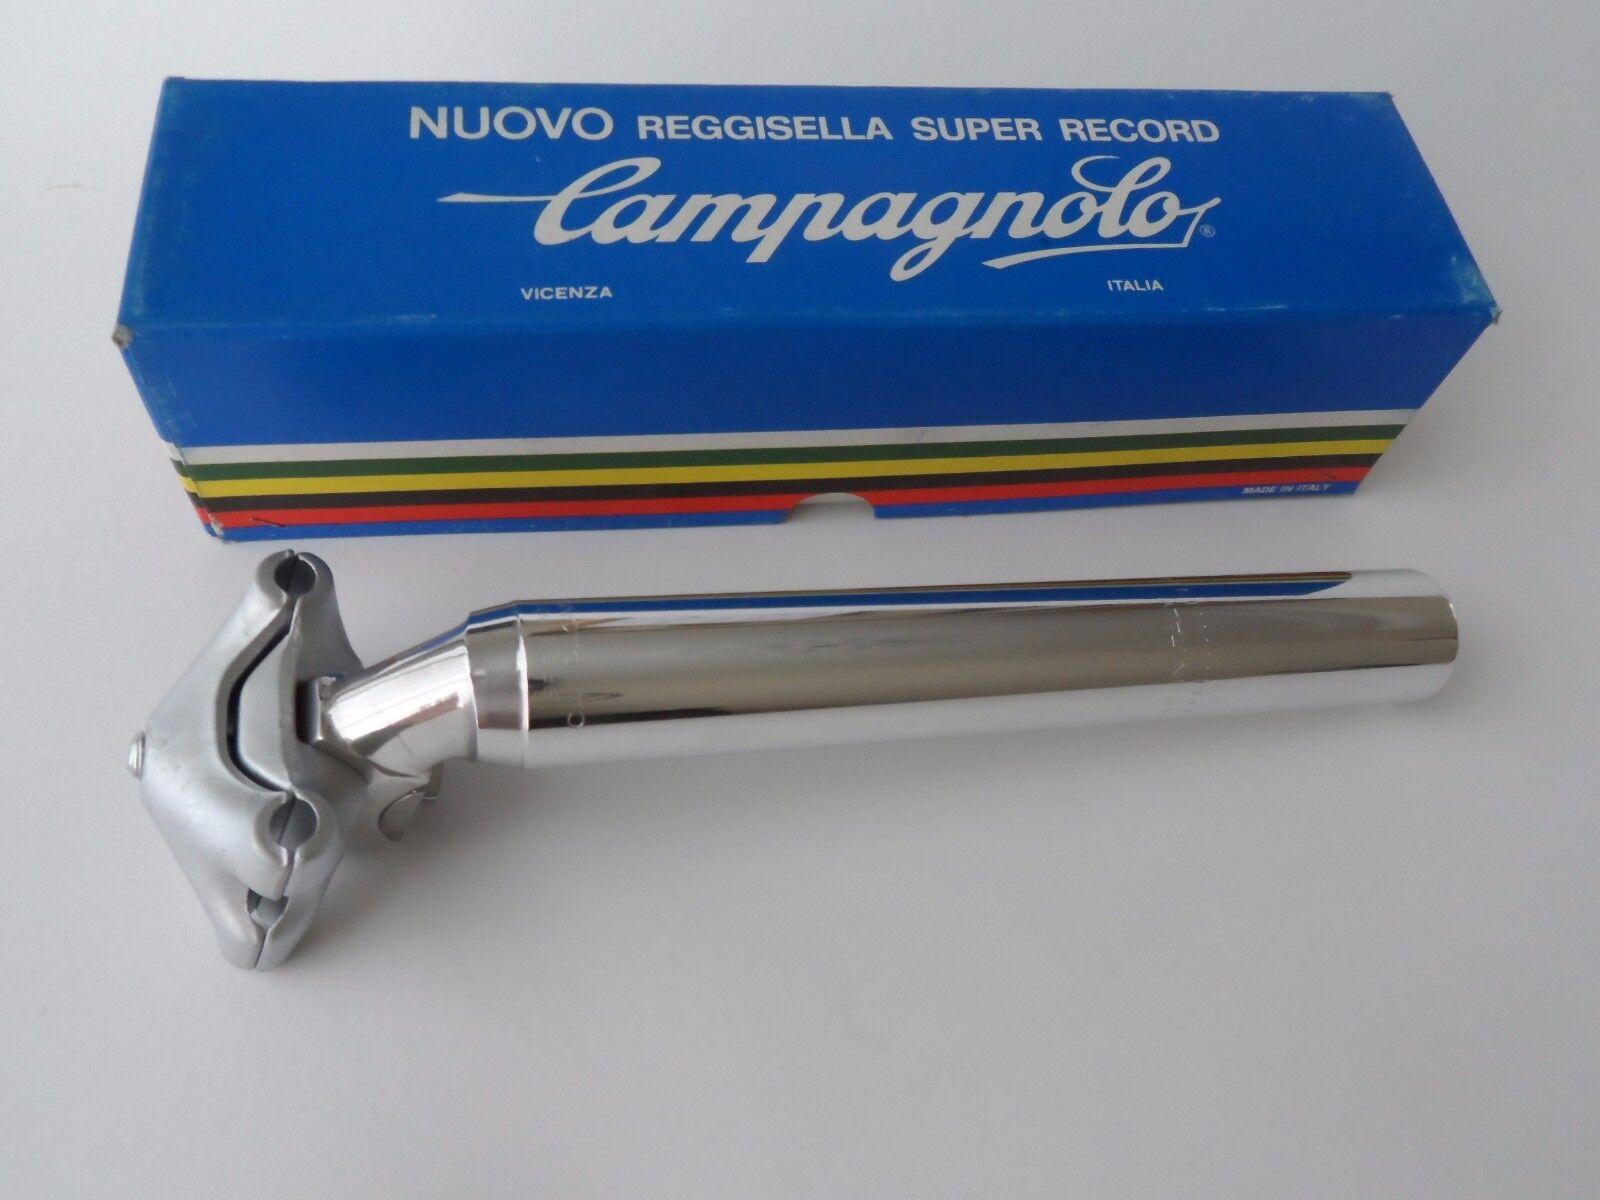 NOS Vintage 1980s Campagnolo Super Record 'last generation' seatpost 26.6mm